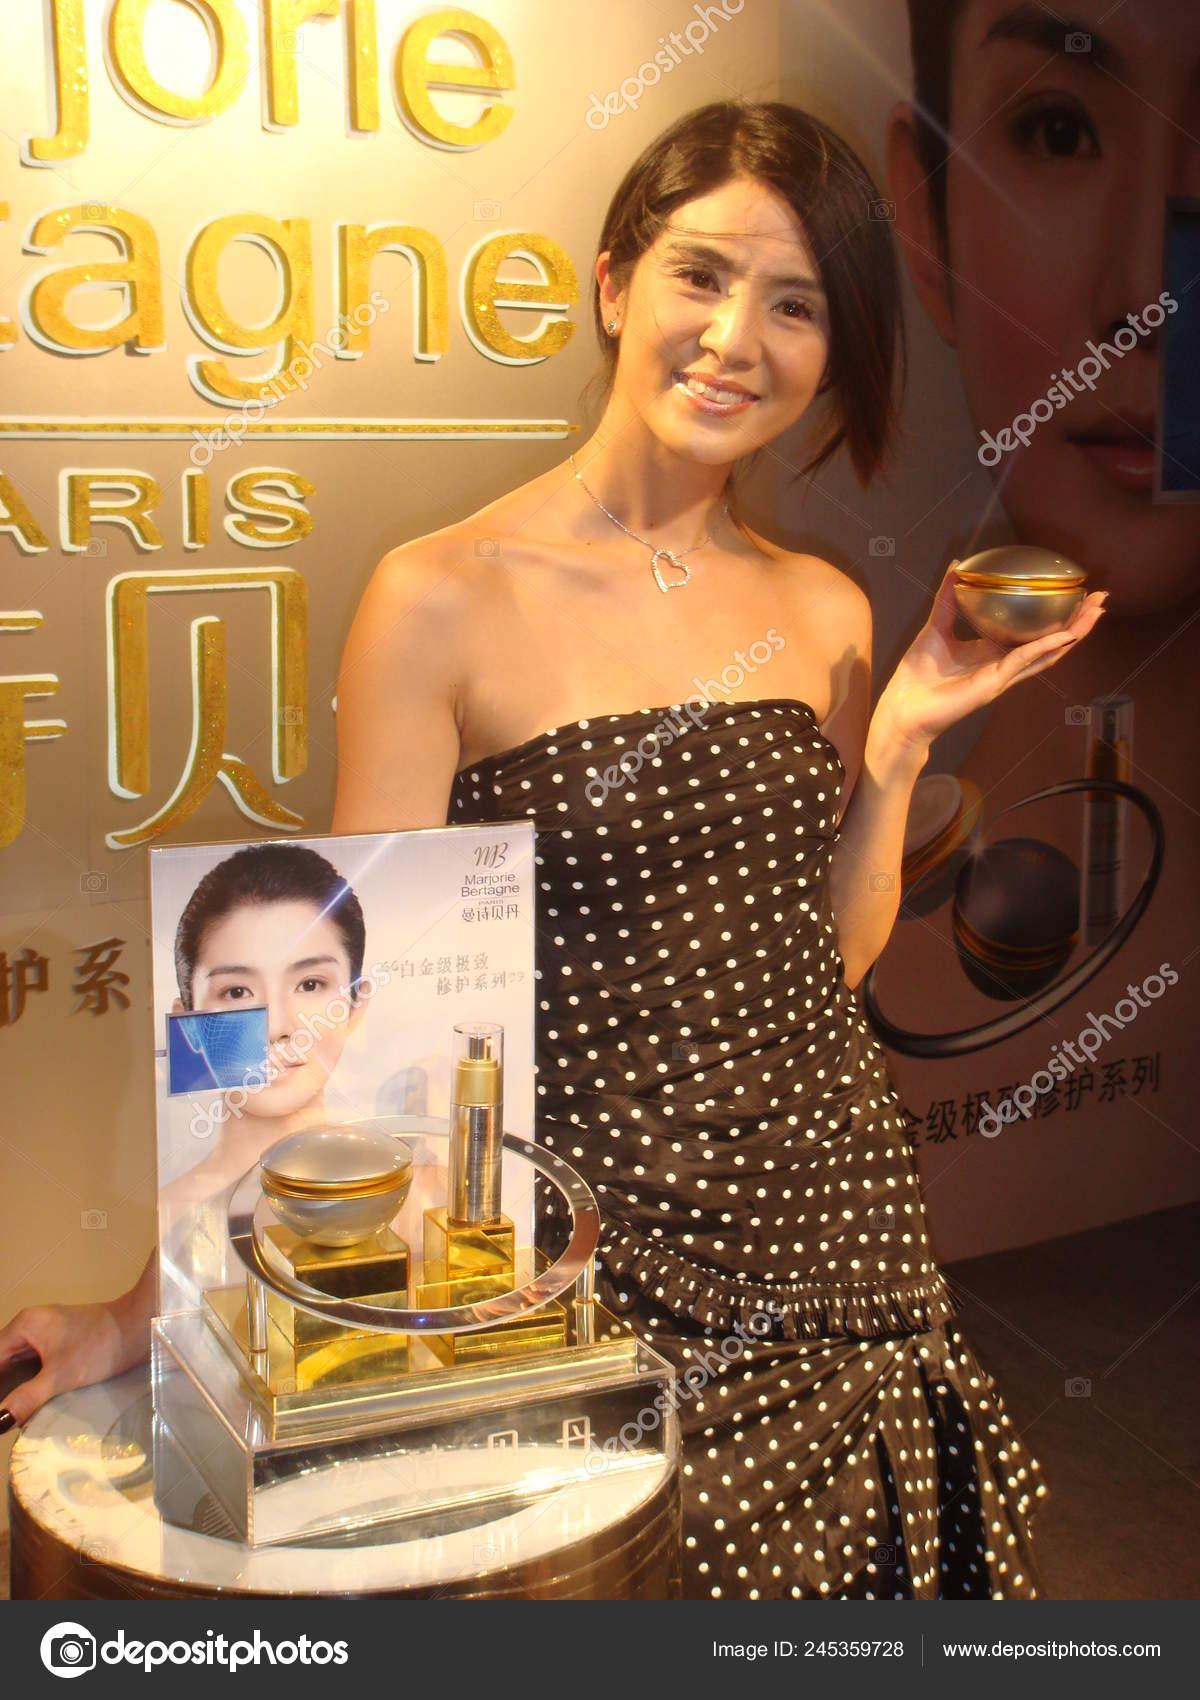 charlie yeung choi-nei